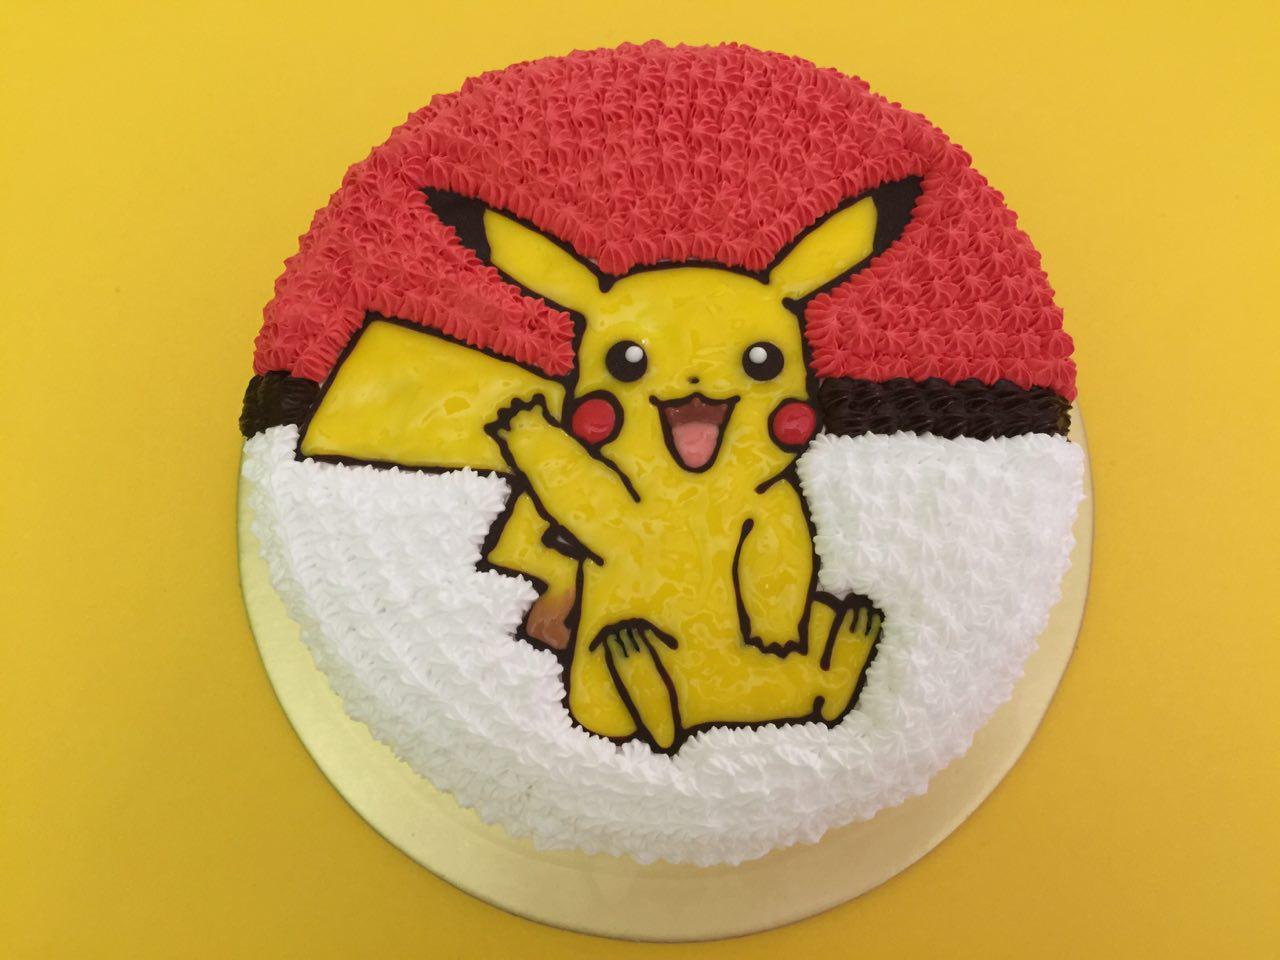 Pikachu Waving on Pokeball